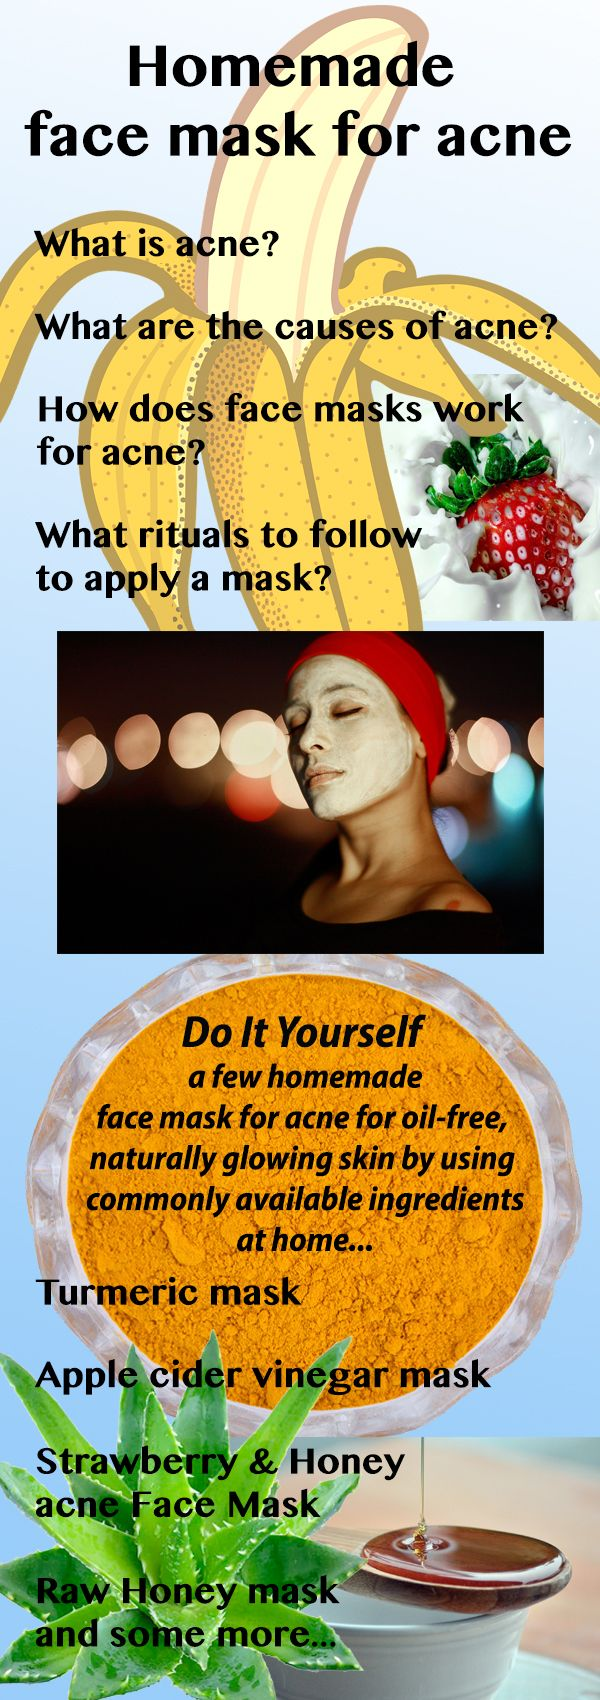 Top 10 Homemade face masks for acne Homemade face masks